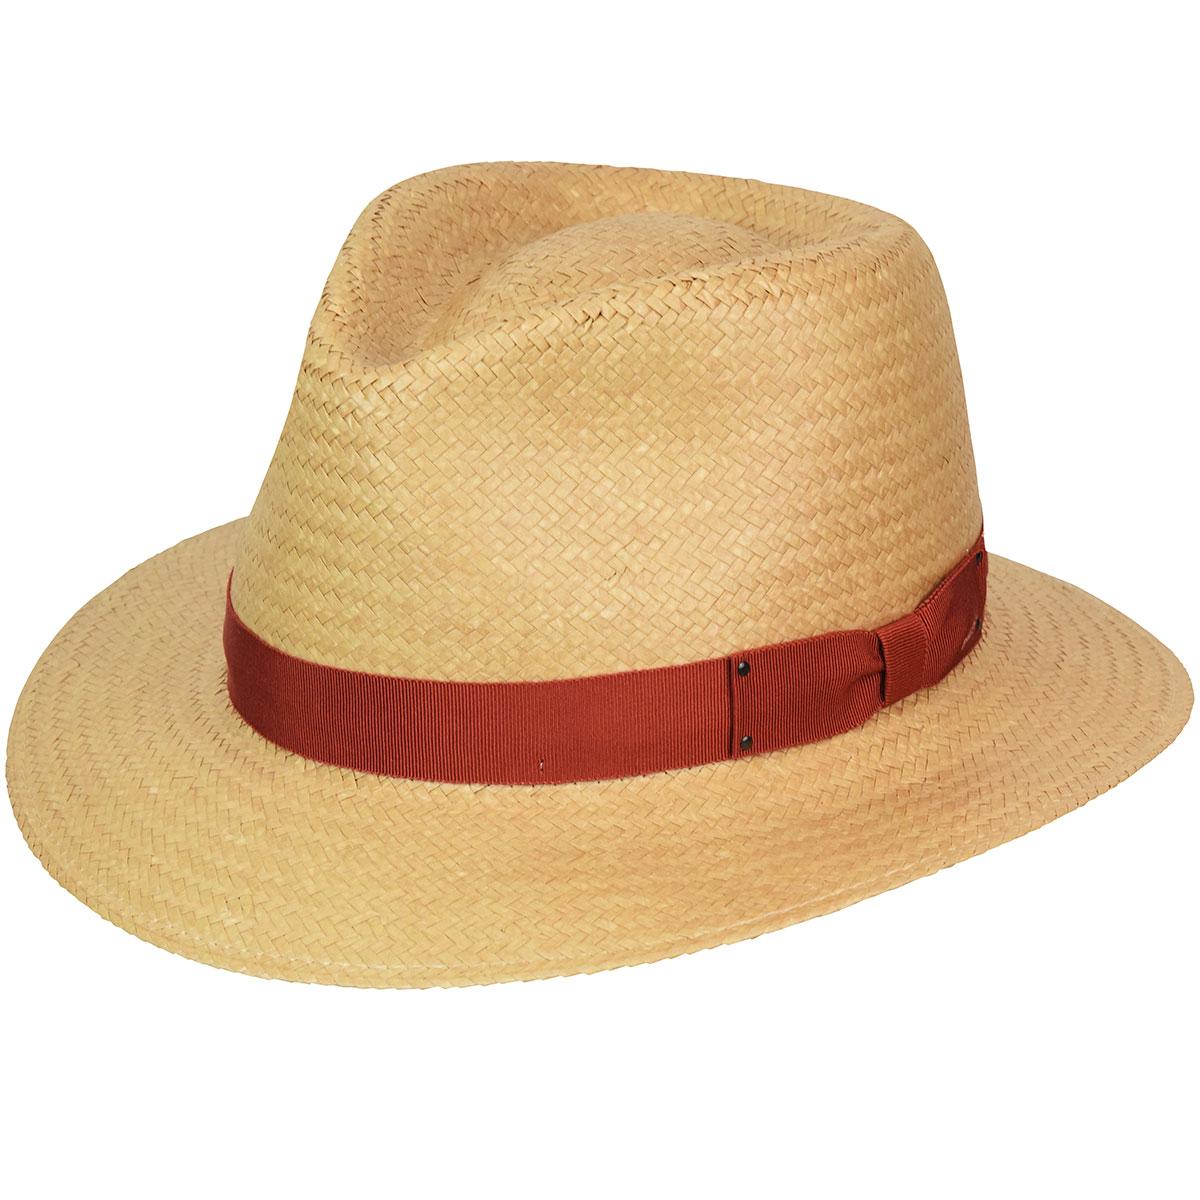 1940s Mens Hats | Fedora, Homburg, Pork Pie Hats Spencer LiteStrawFedora $85.00 AT vintagedancer.com